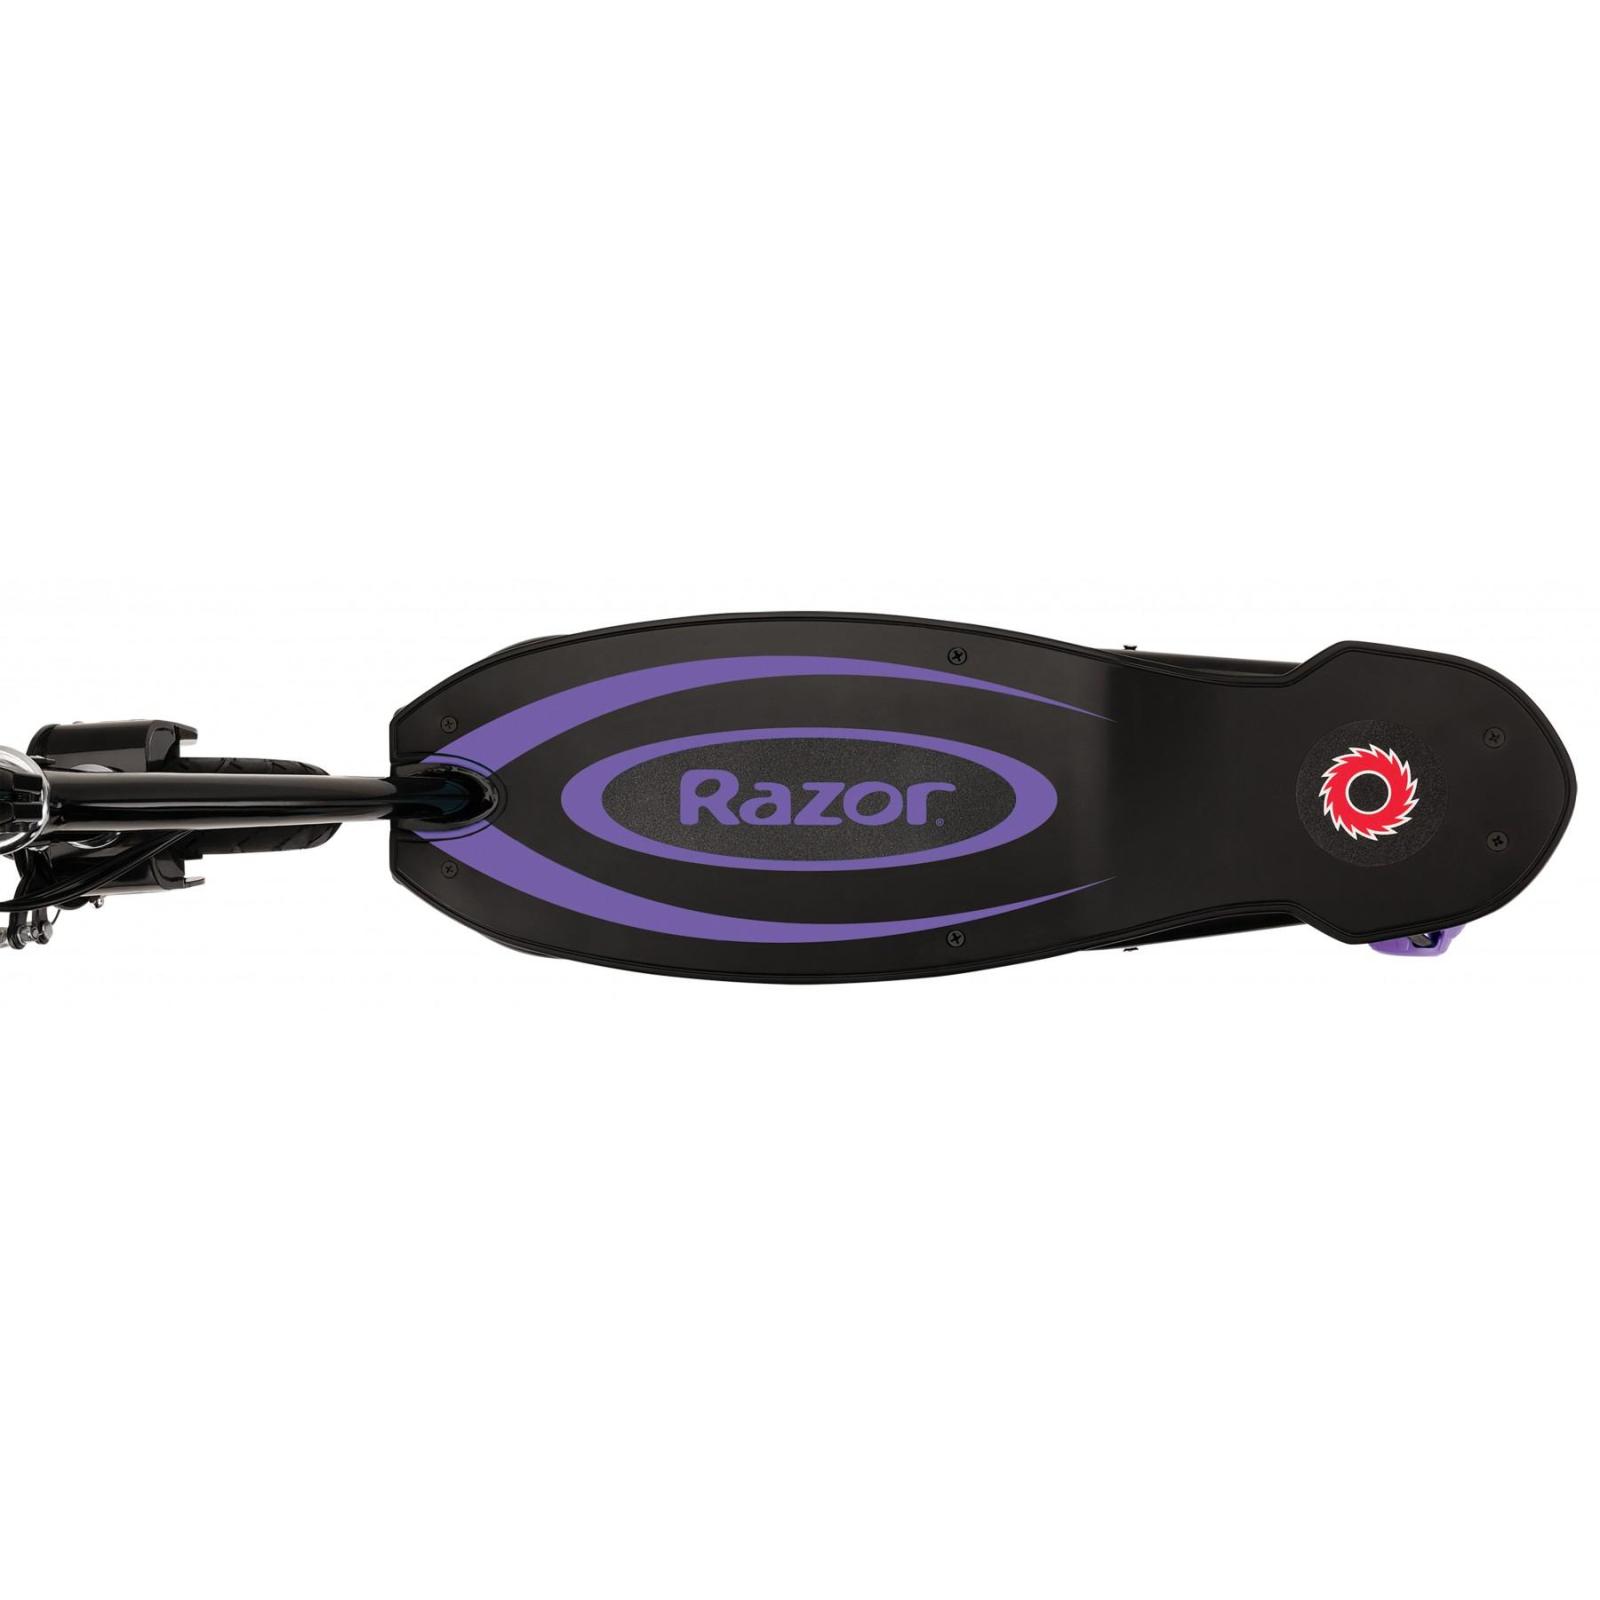 Электросамокат Razor Power Core E100 Purple (283570) изображение 7